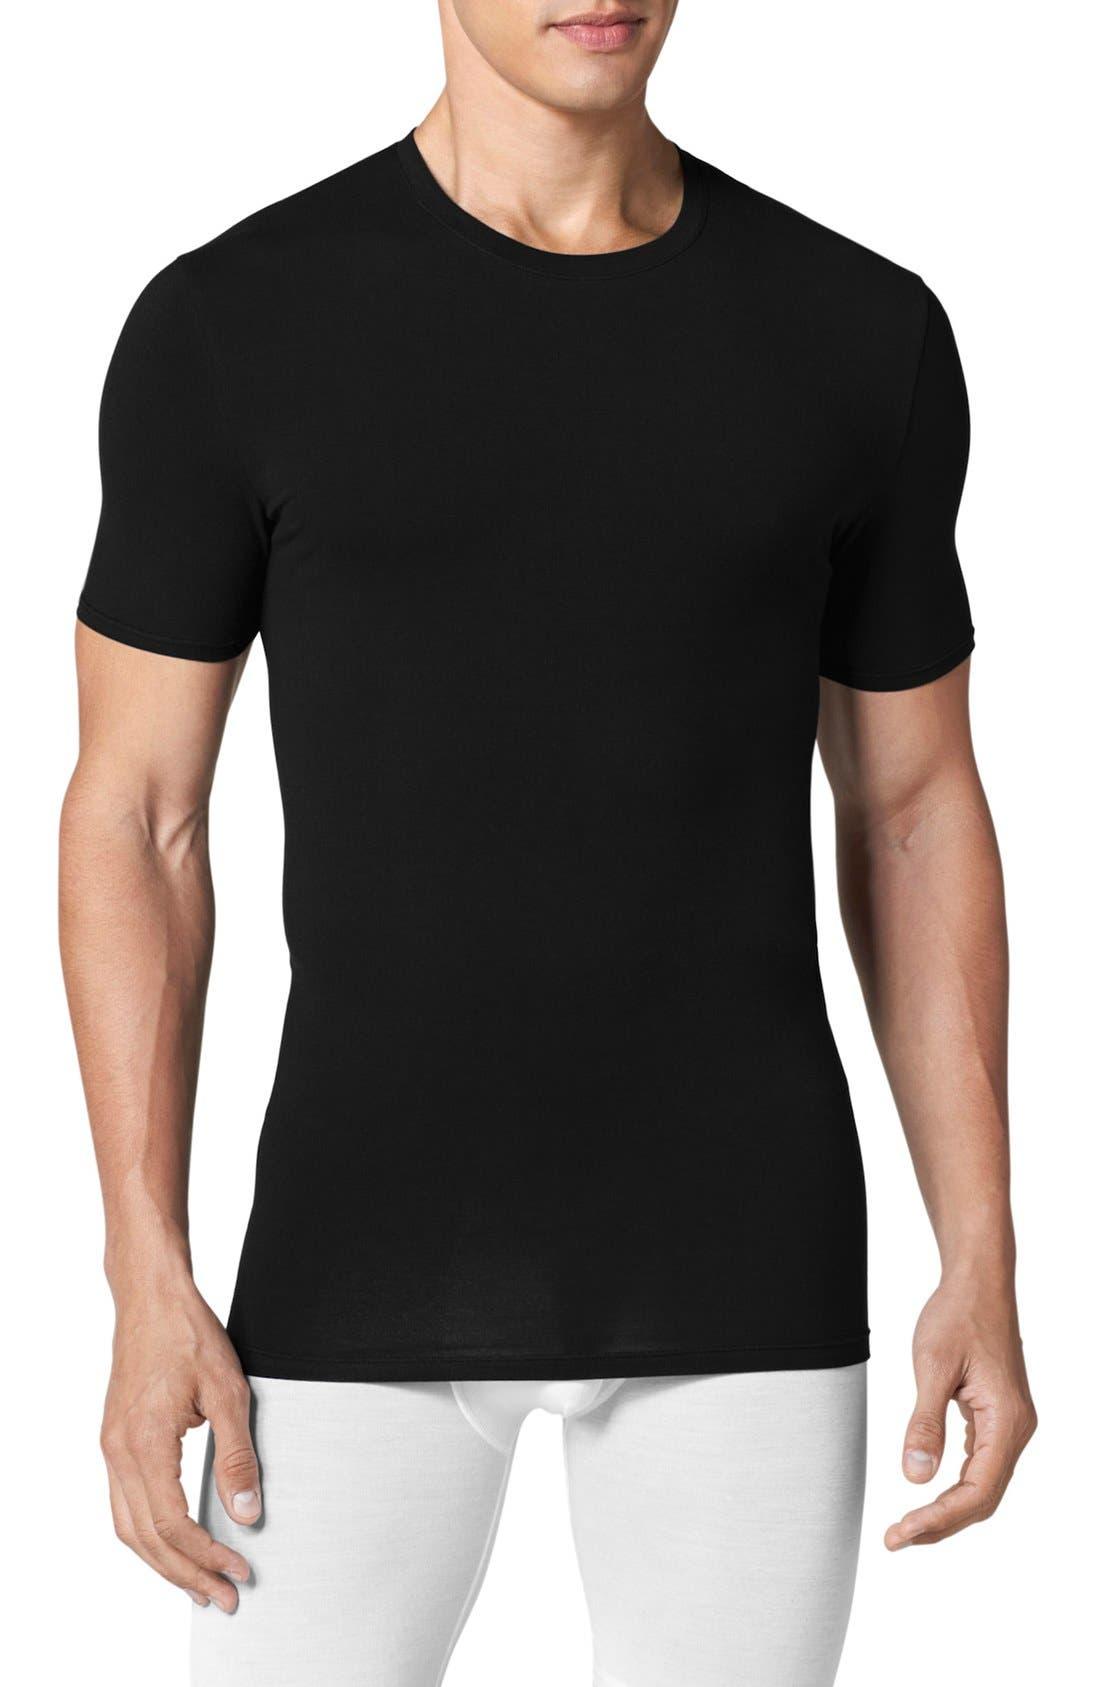 TOMMY JOHN Men'S Stay-Tucked Crew-Neck T-Shirt in Black